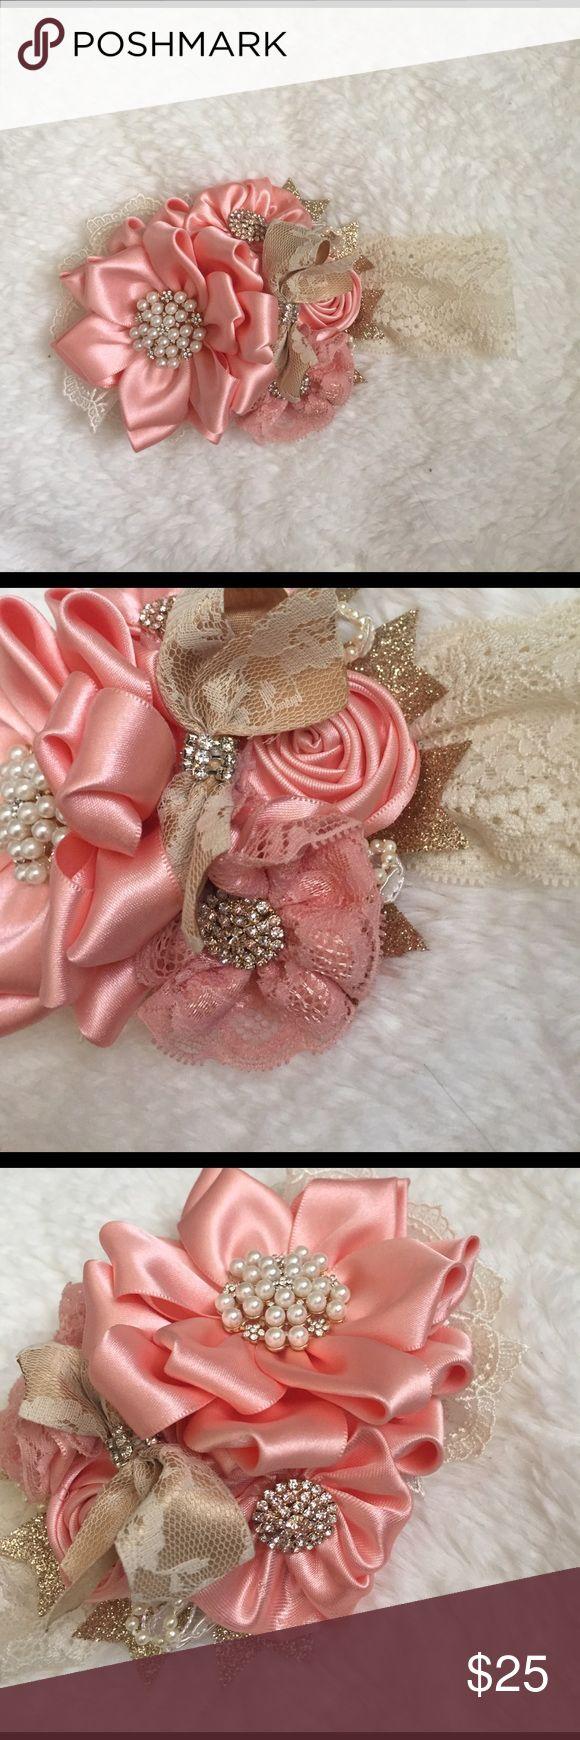 Zara baby hair accessories - Vintage Baby Headband